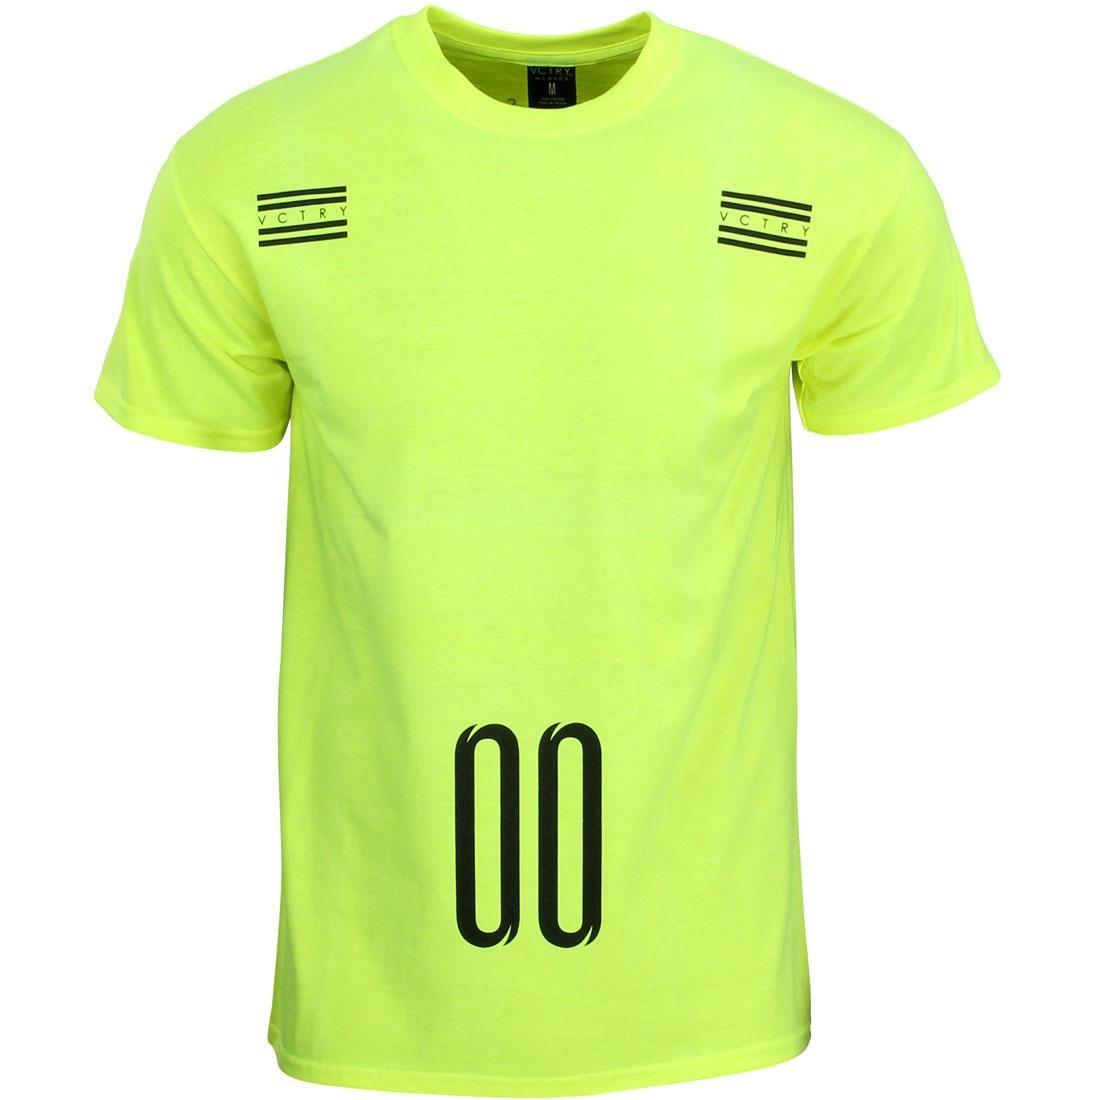 10 Deep Penalty Tee (green / neon)